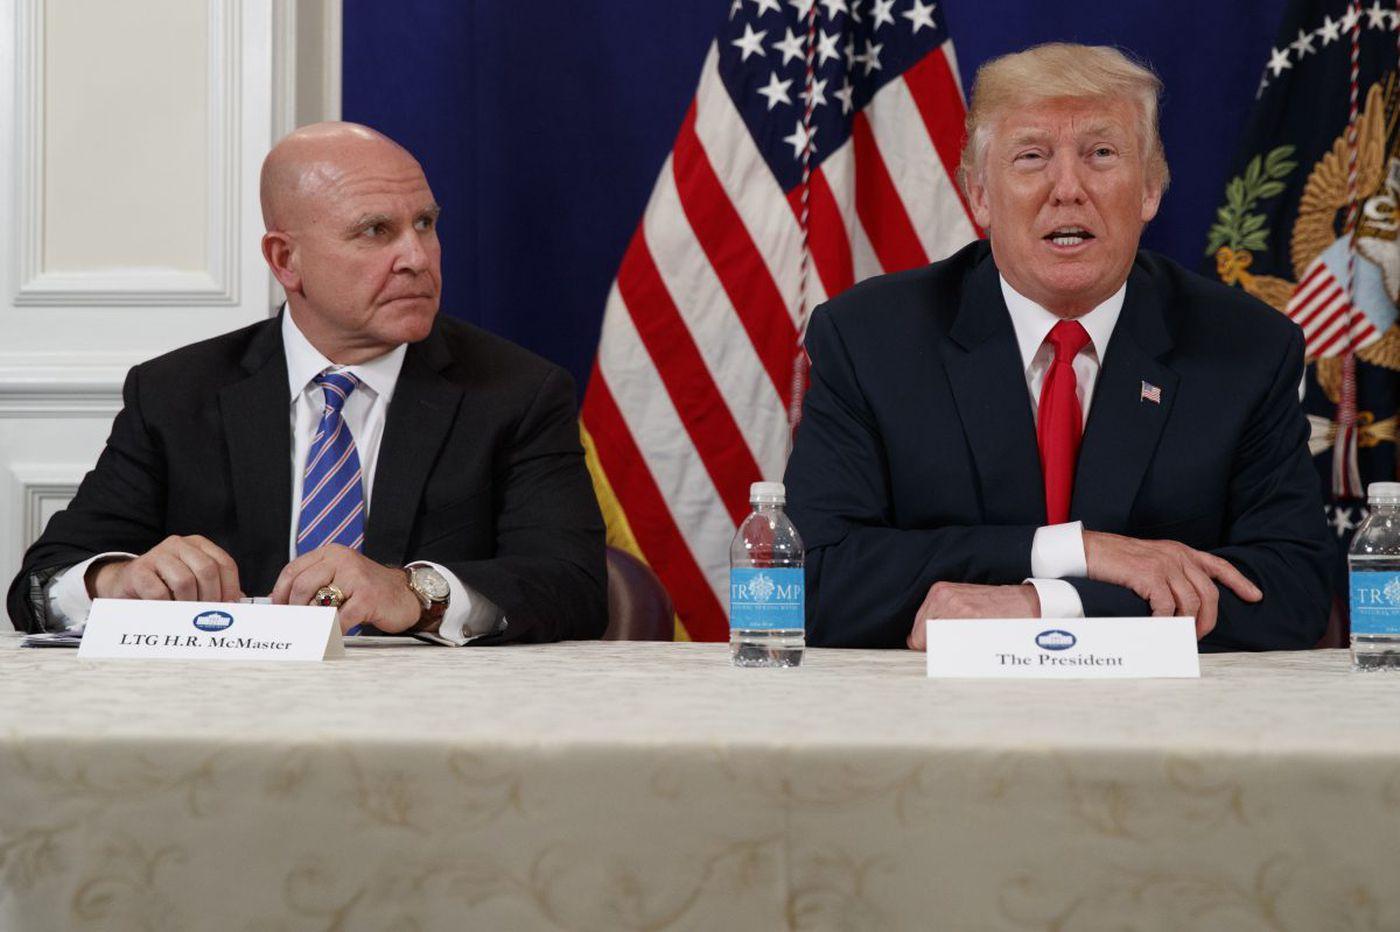 To save Afghanistan, Trump needs new strategy toward terrorist-enabler Pakistan | Trudy Rubin